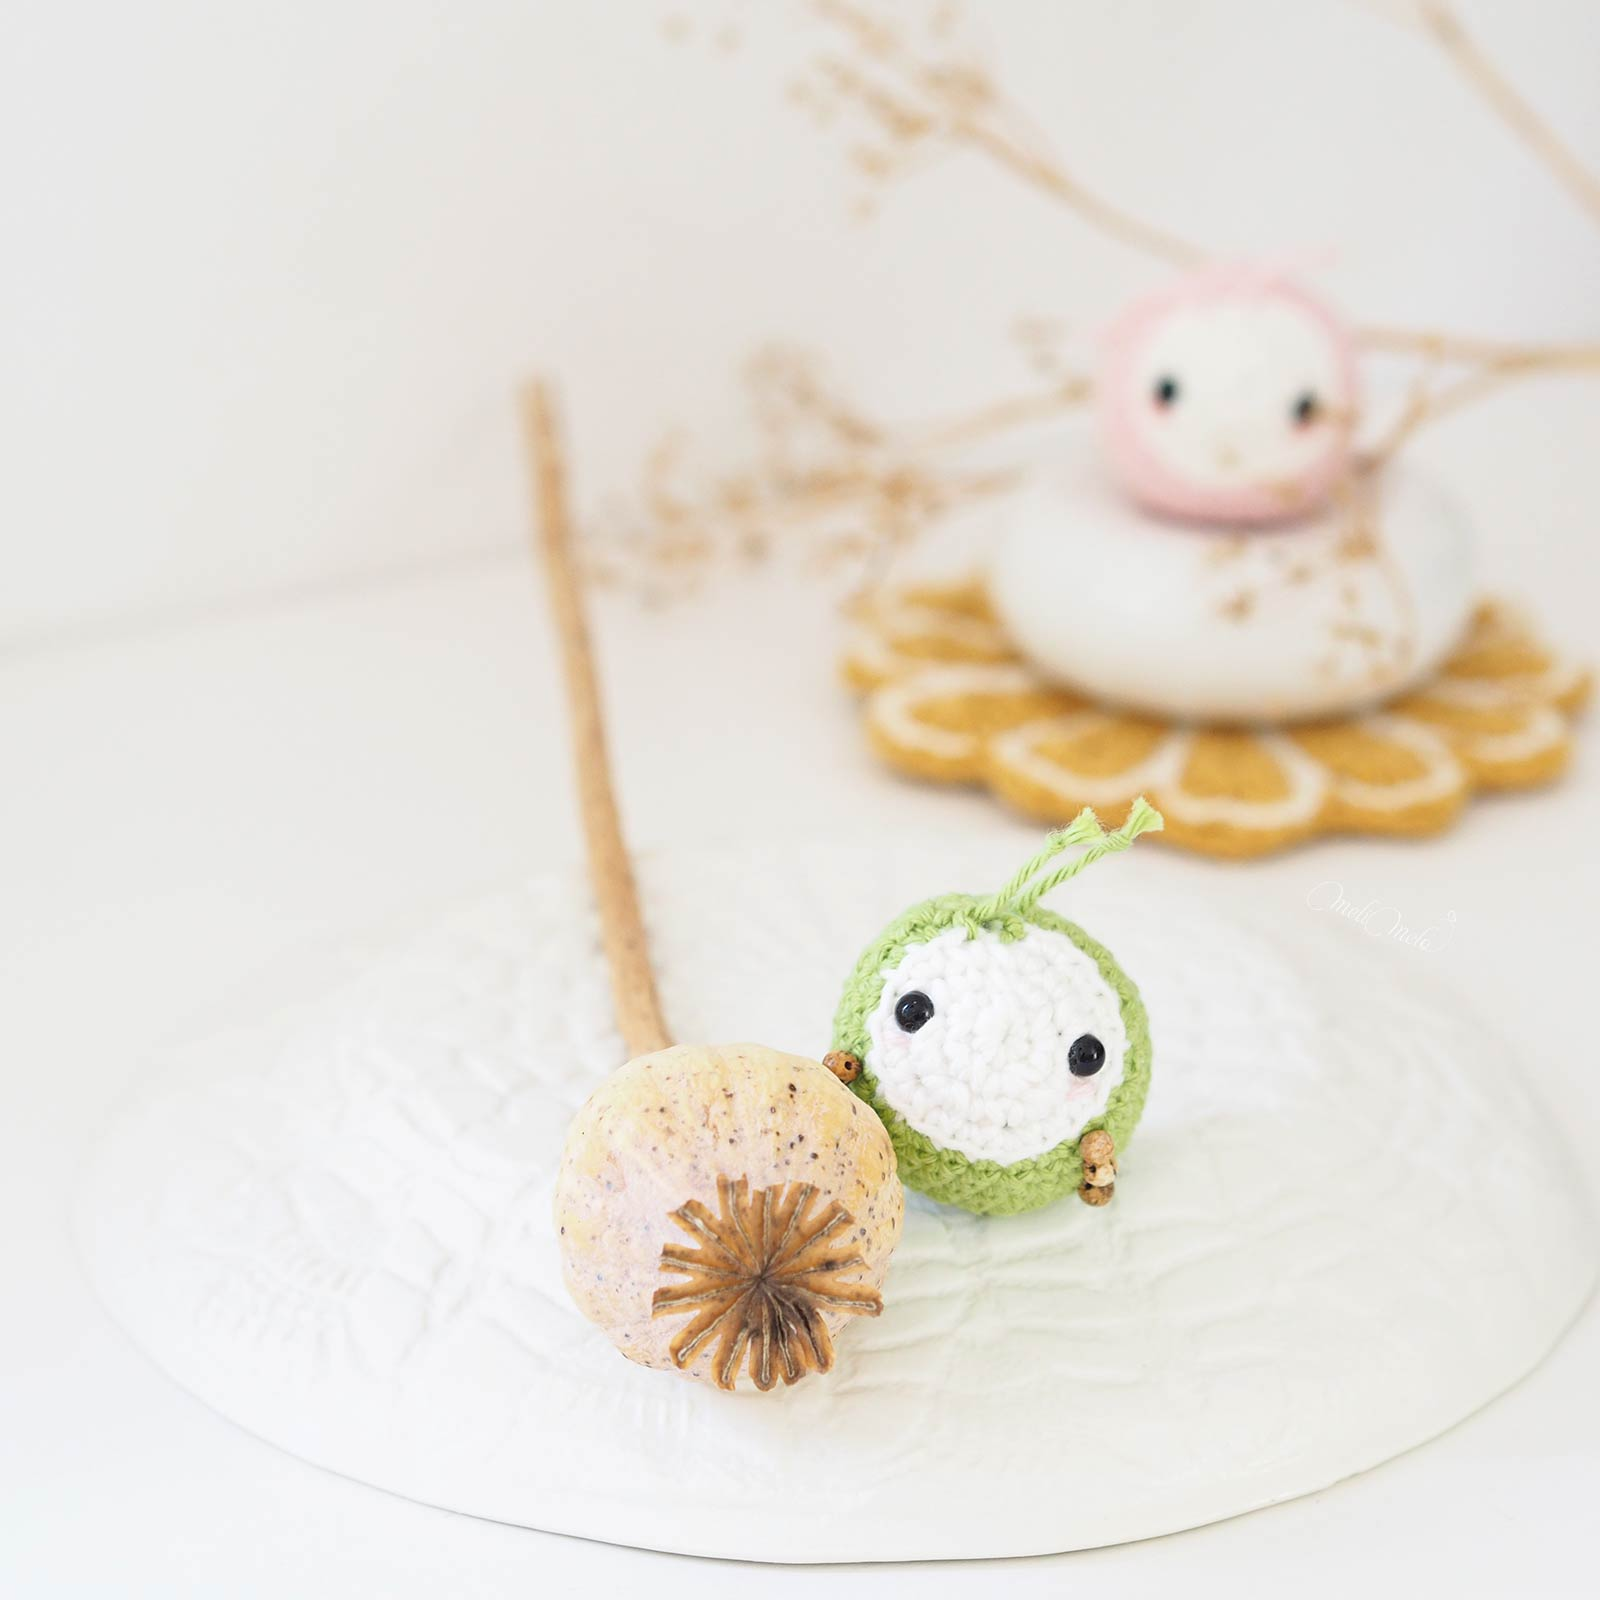 pavot-puceron-crochet-amigurumi-lalylaland-ricorumi-laboutiquedemelimelo